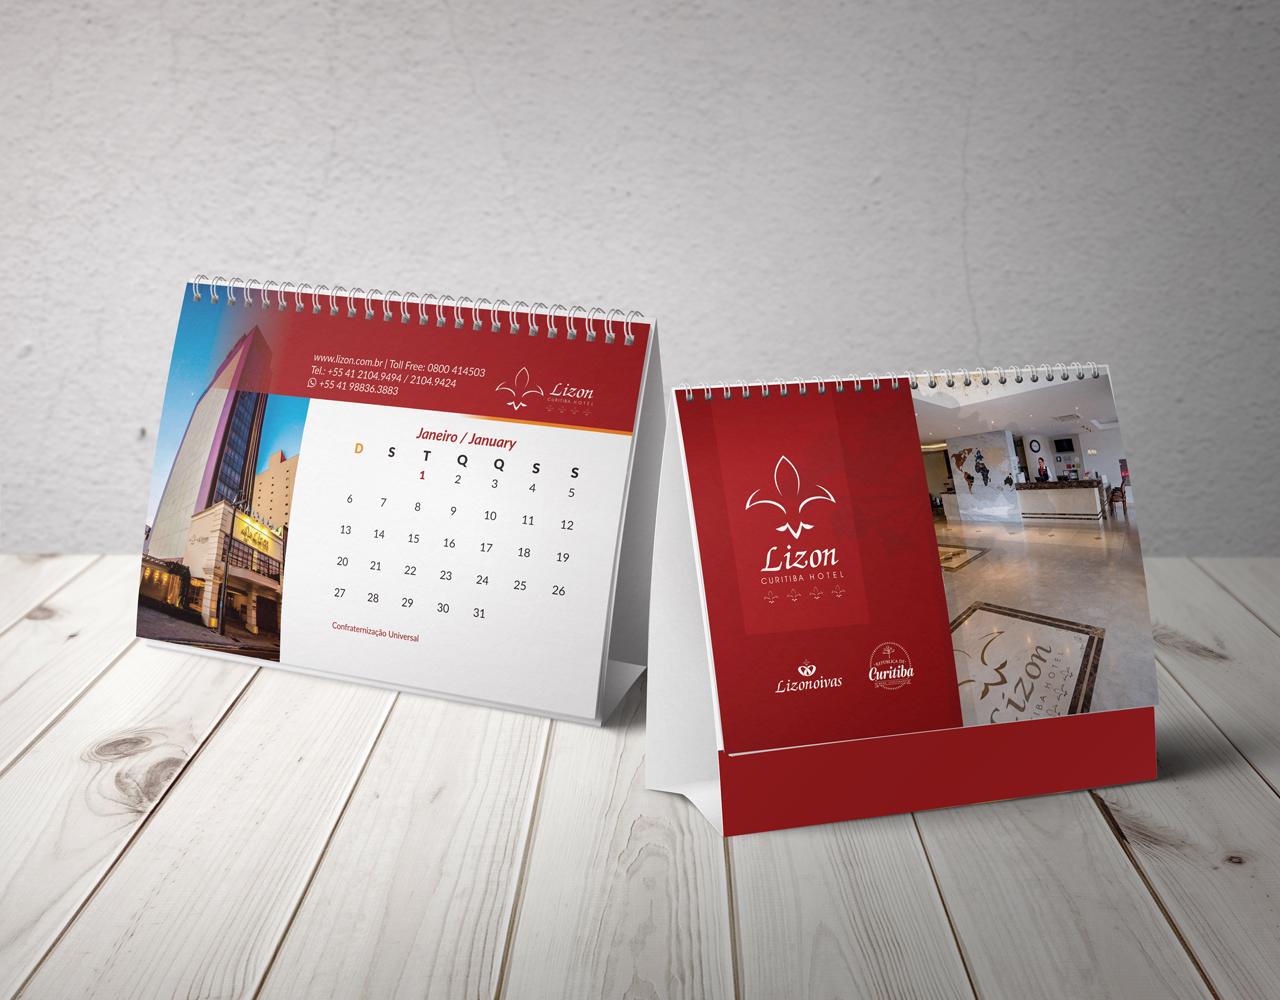 moodesign_lizon_curitiba_hotel